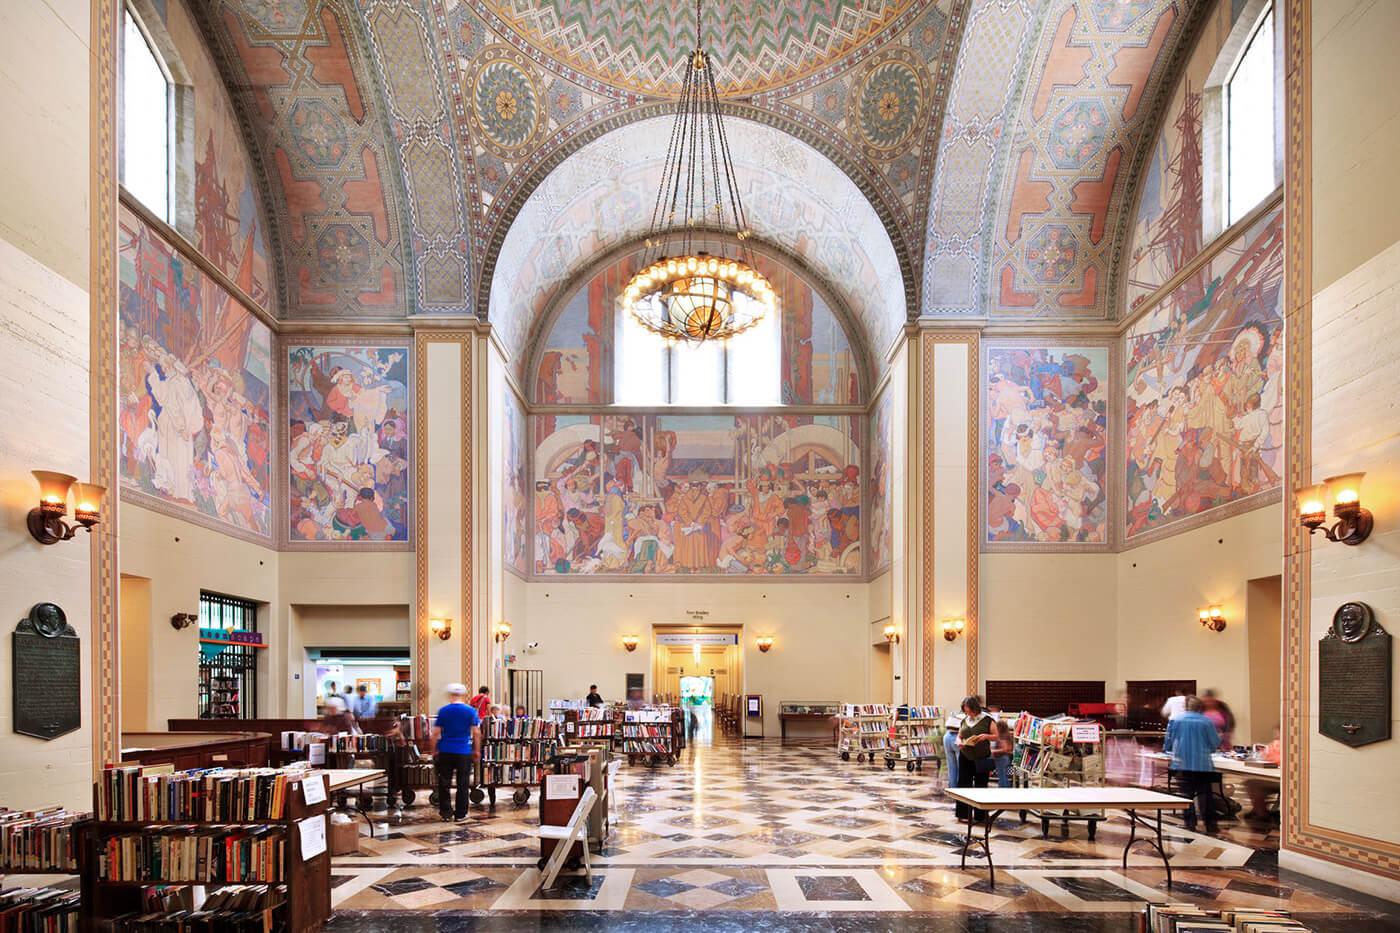 Los Angeles Central Library in Los Angeles CA